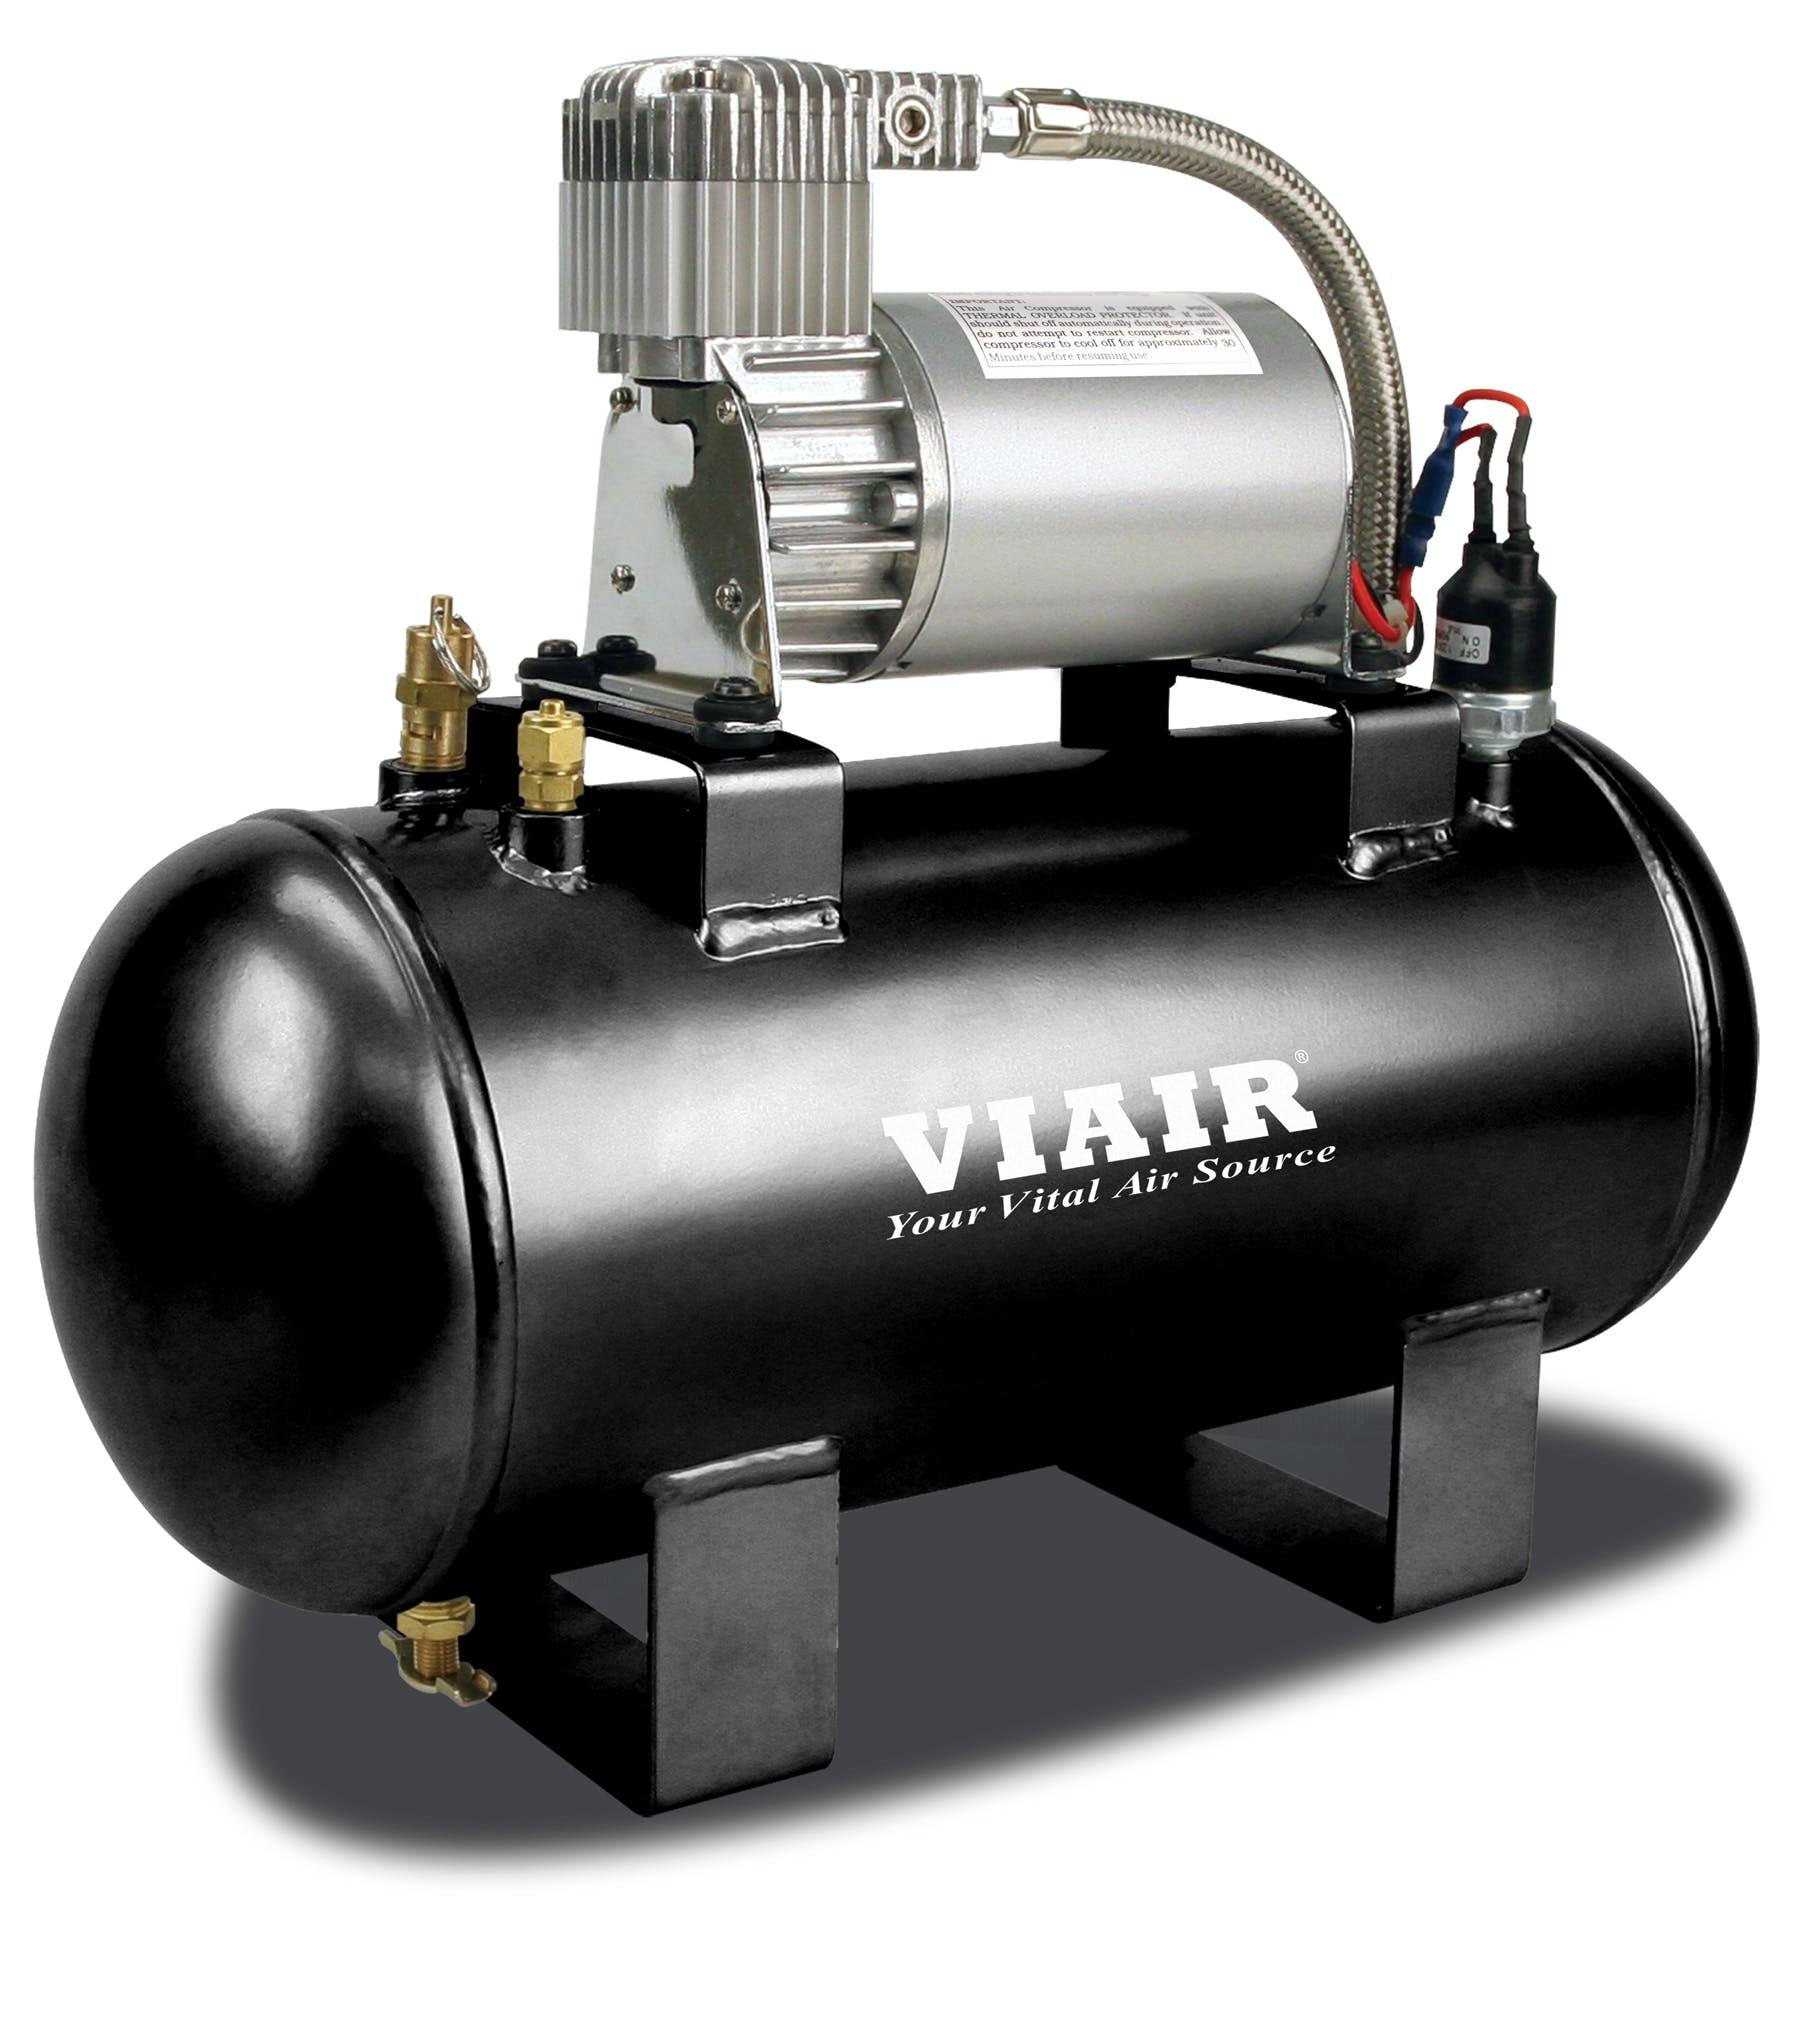 Viair 90004 Tank Port Fittings Kit